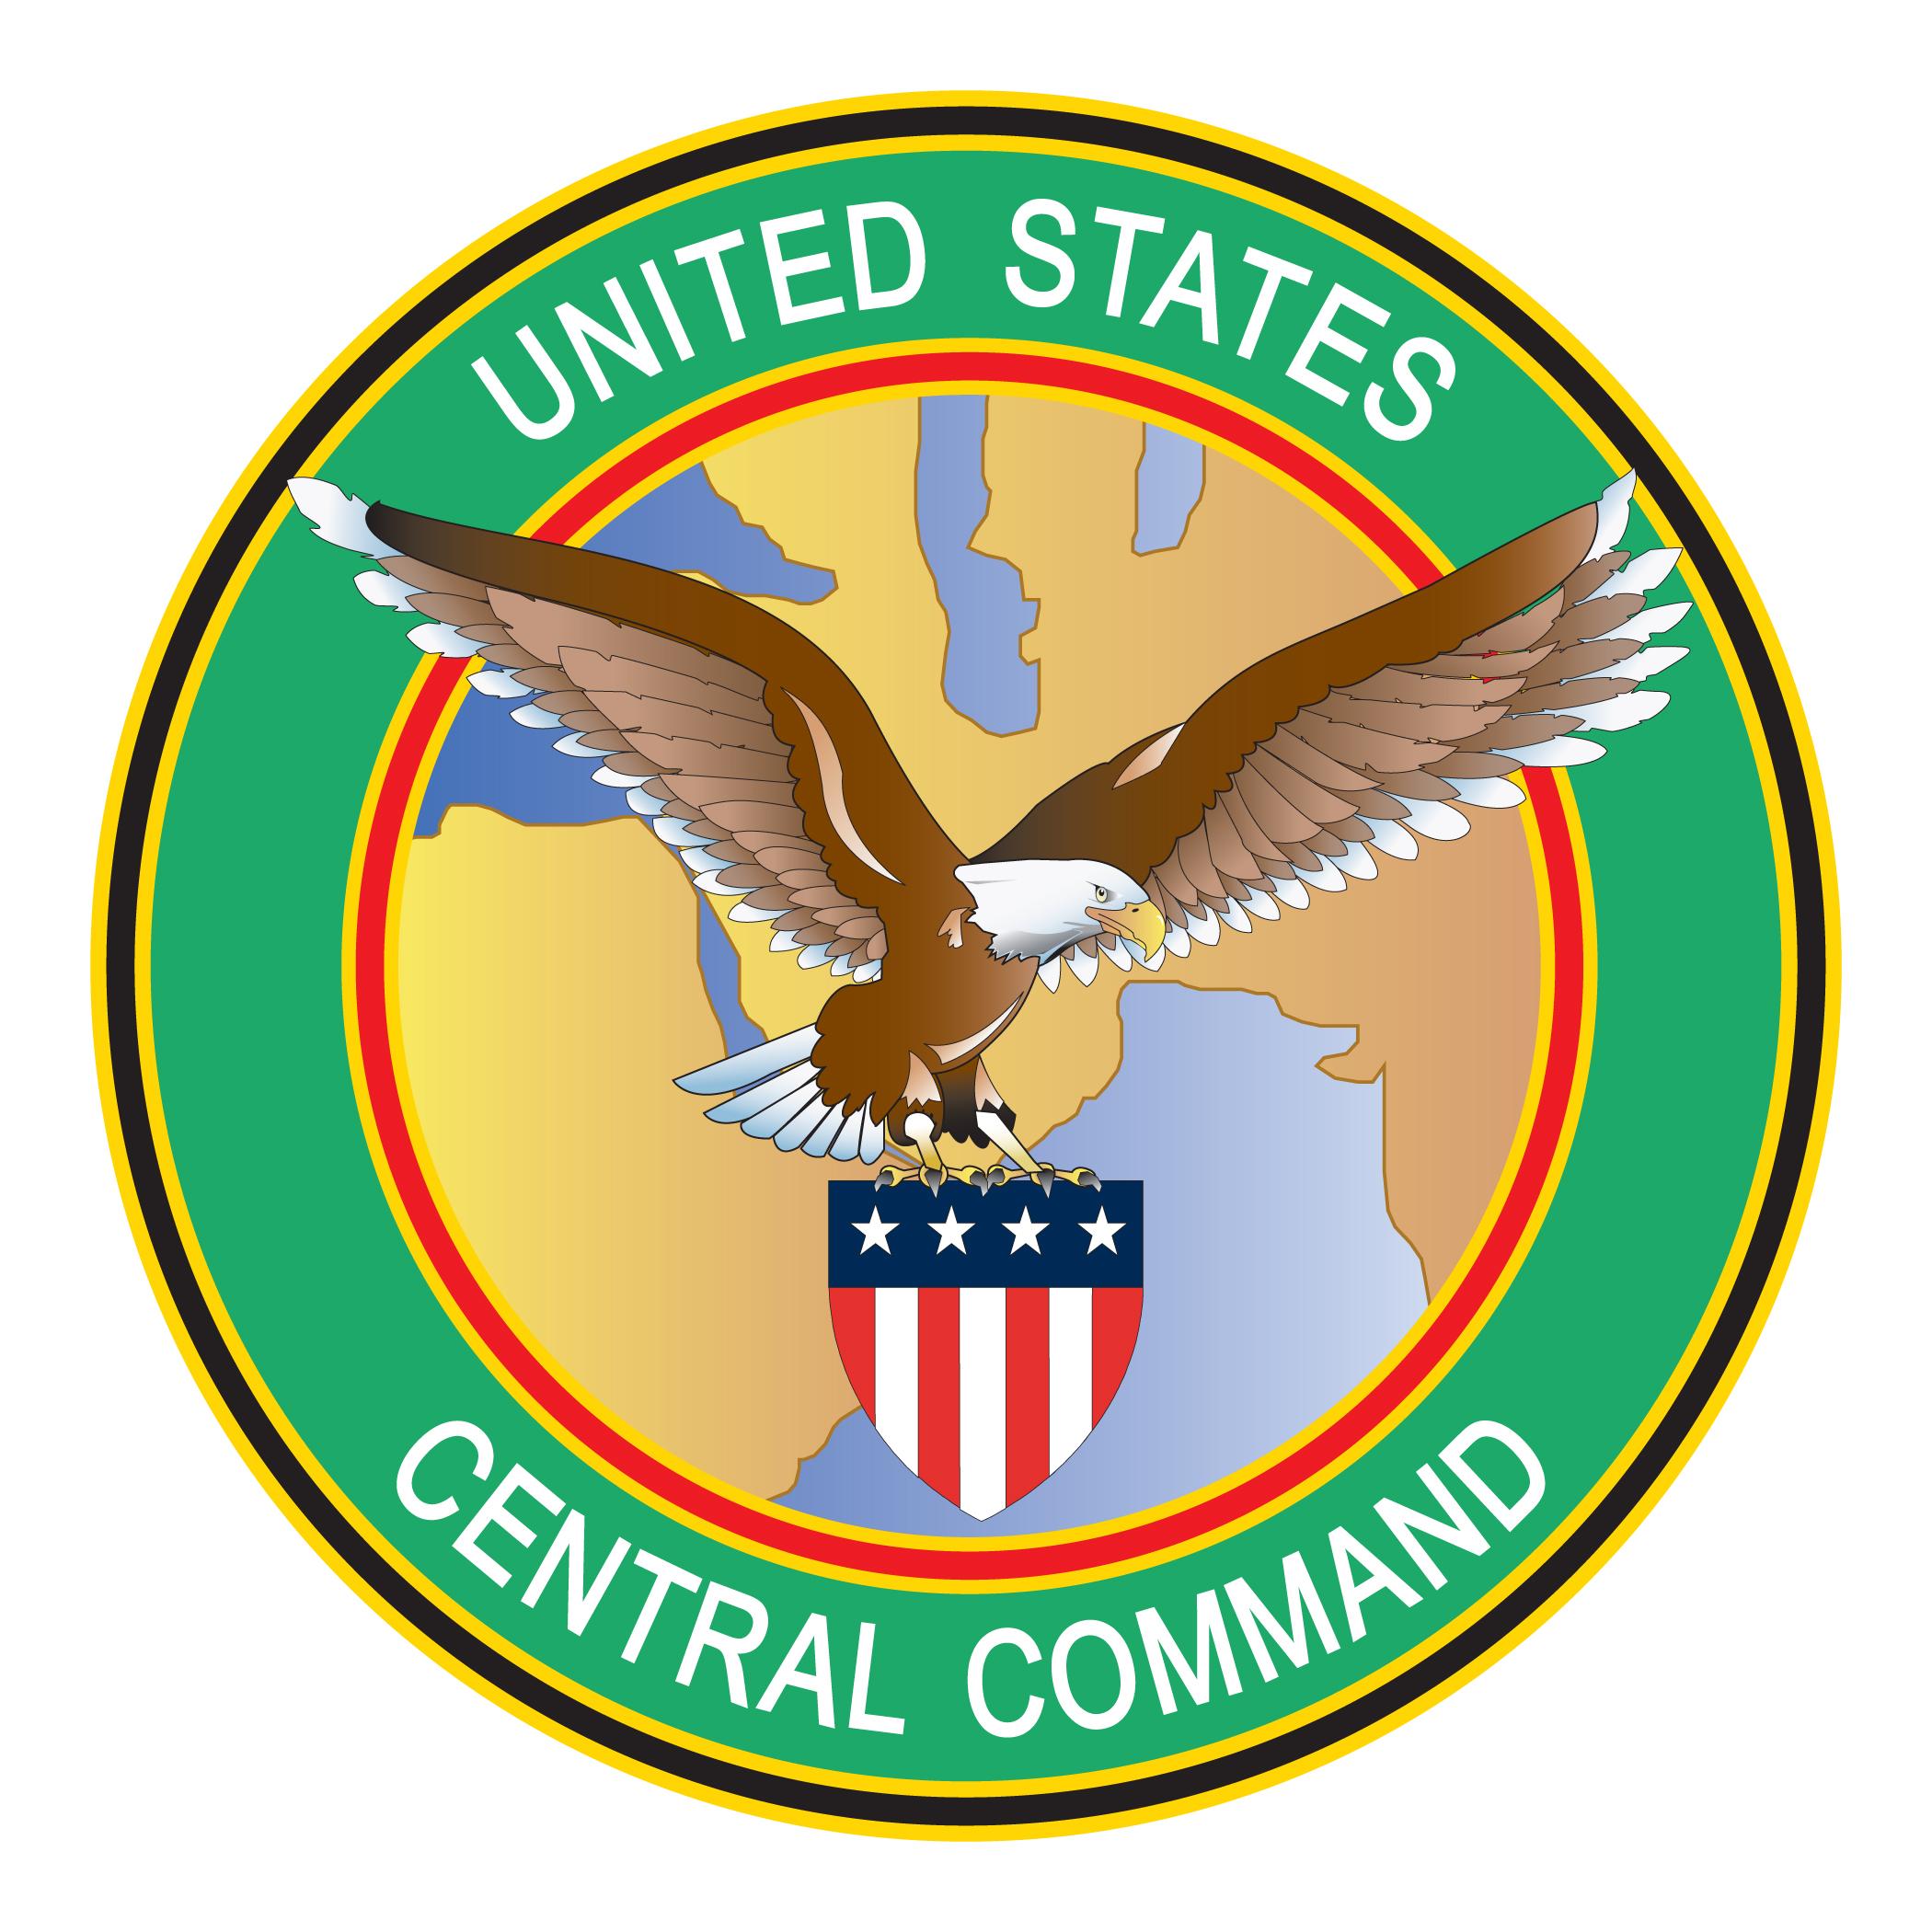 Emblem of U.S. Central Command.jpg